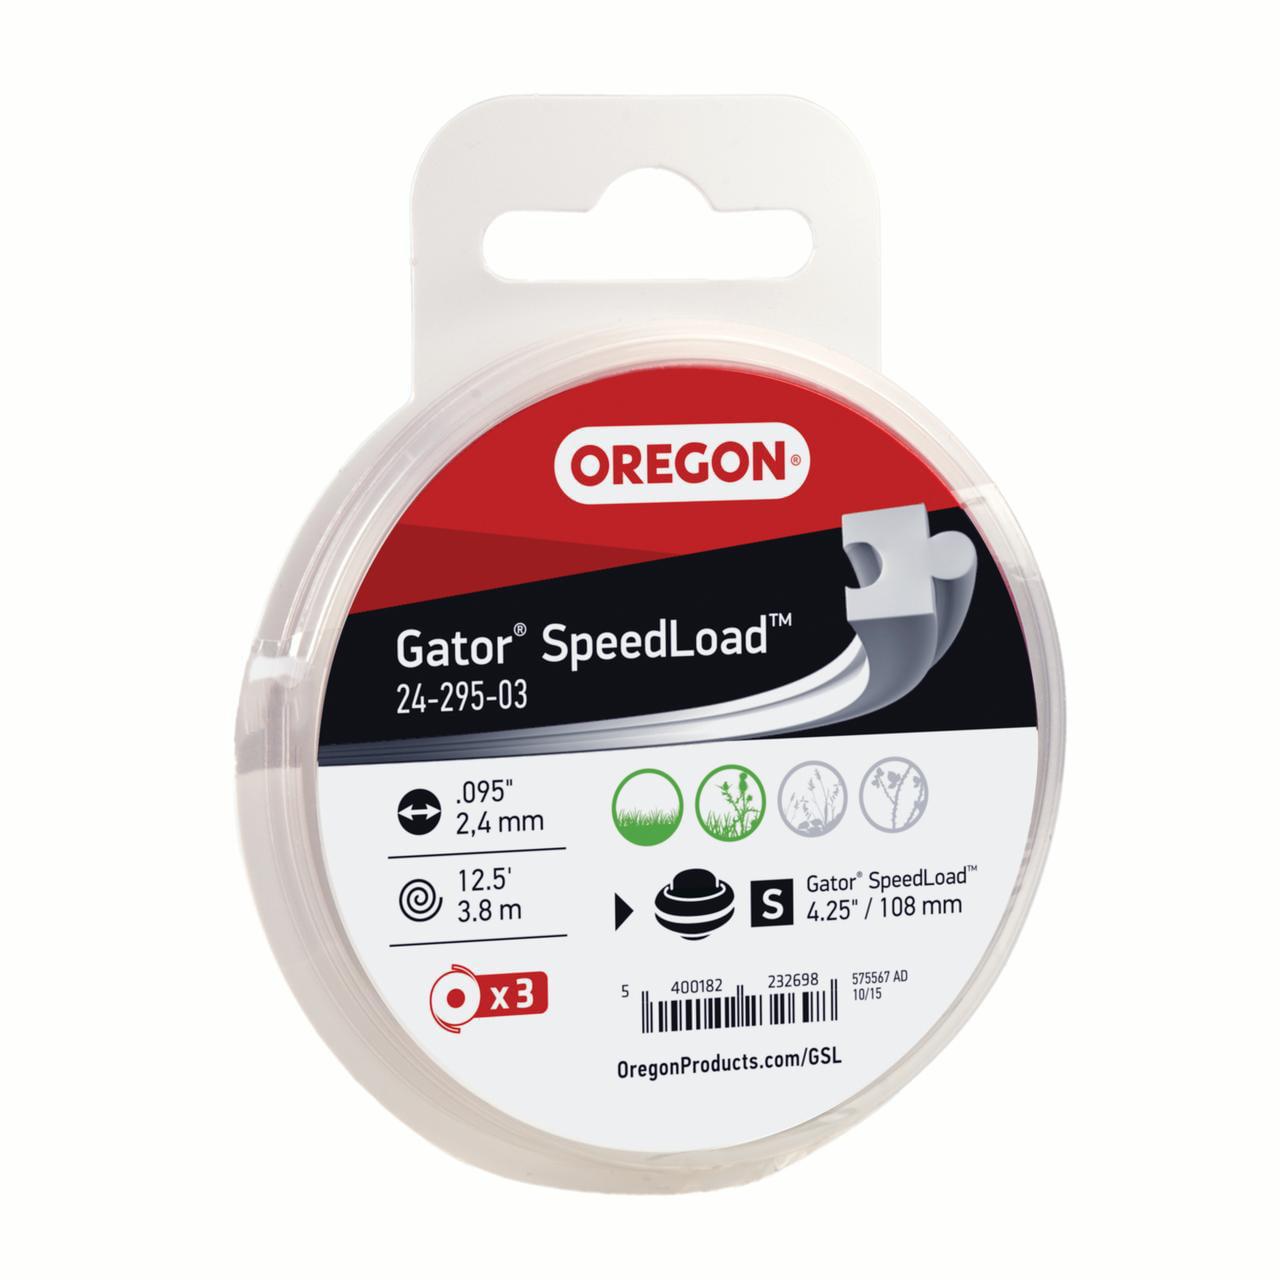 Gator SpeedLoad,SM Disk,.095,3Pk